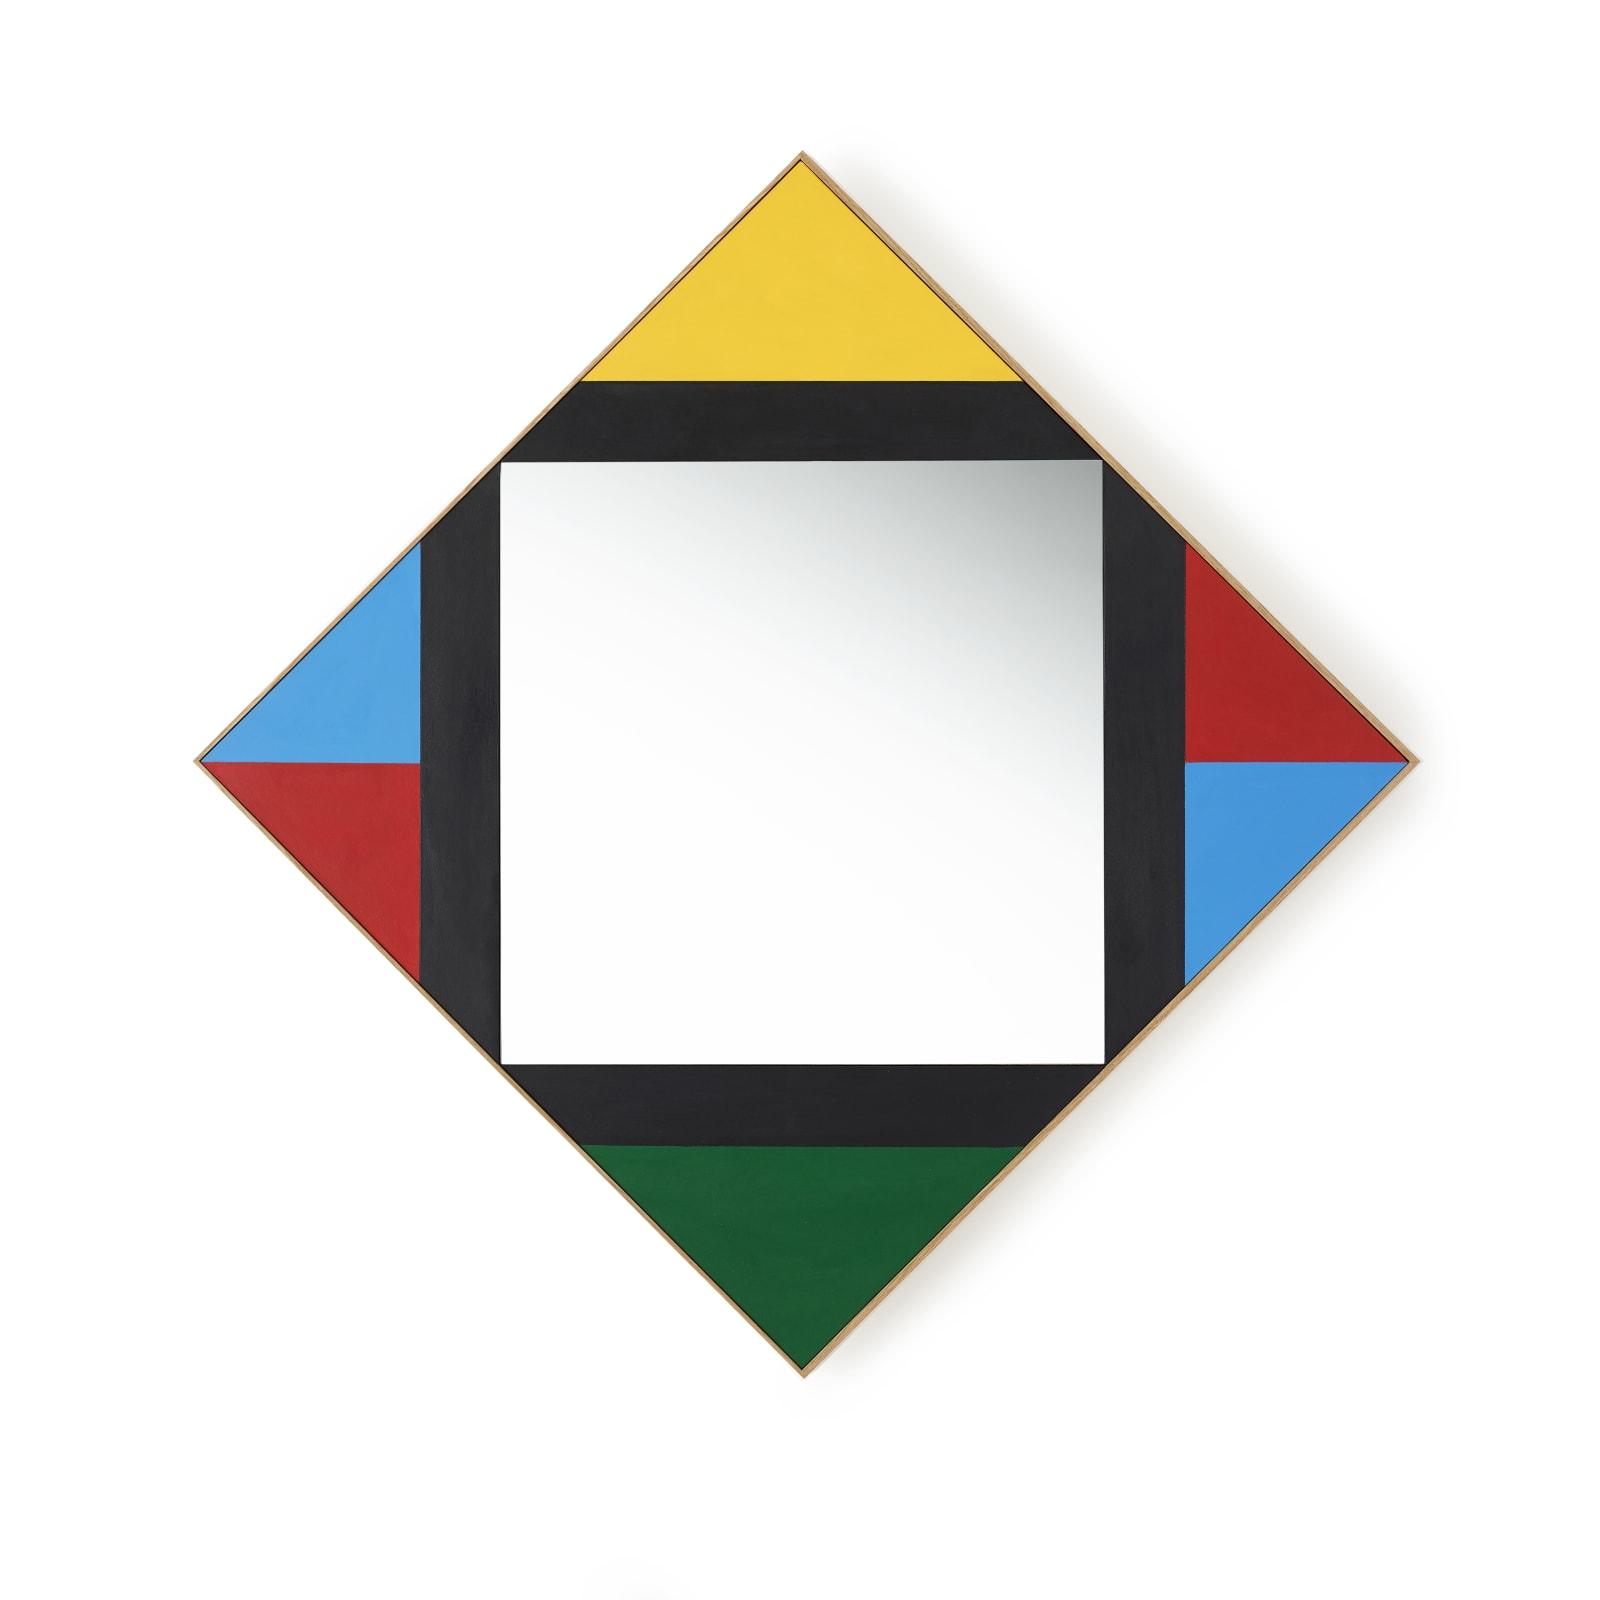 Quadrant Mirror No.3